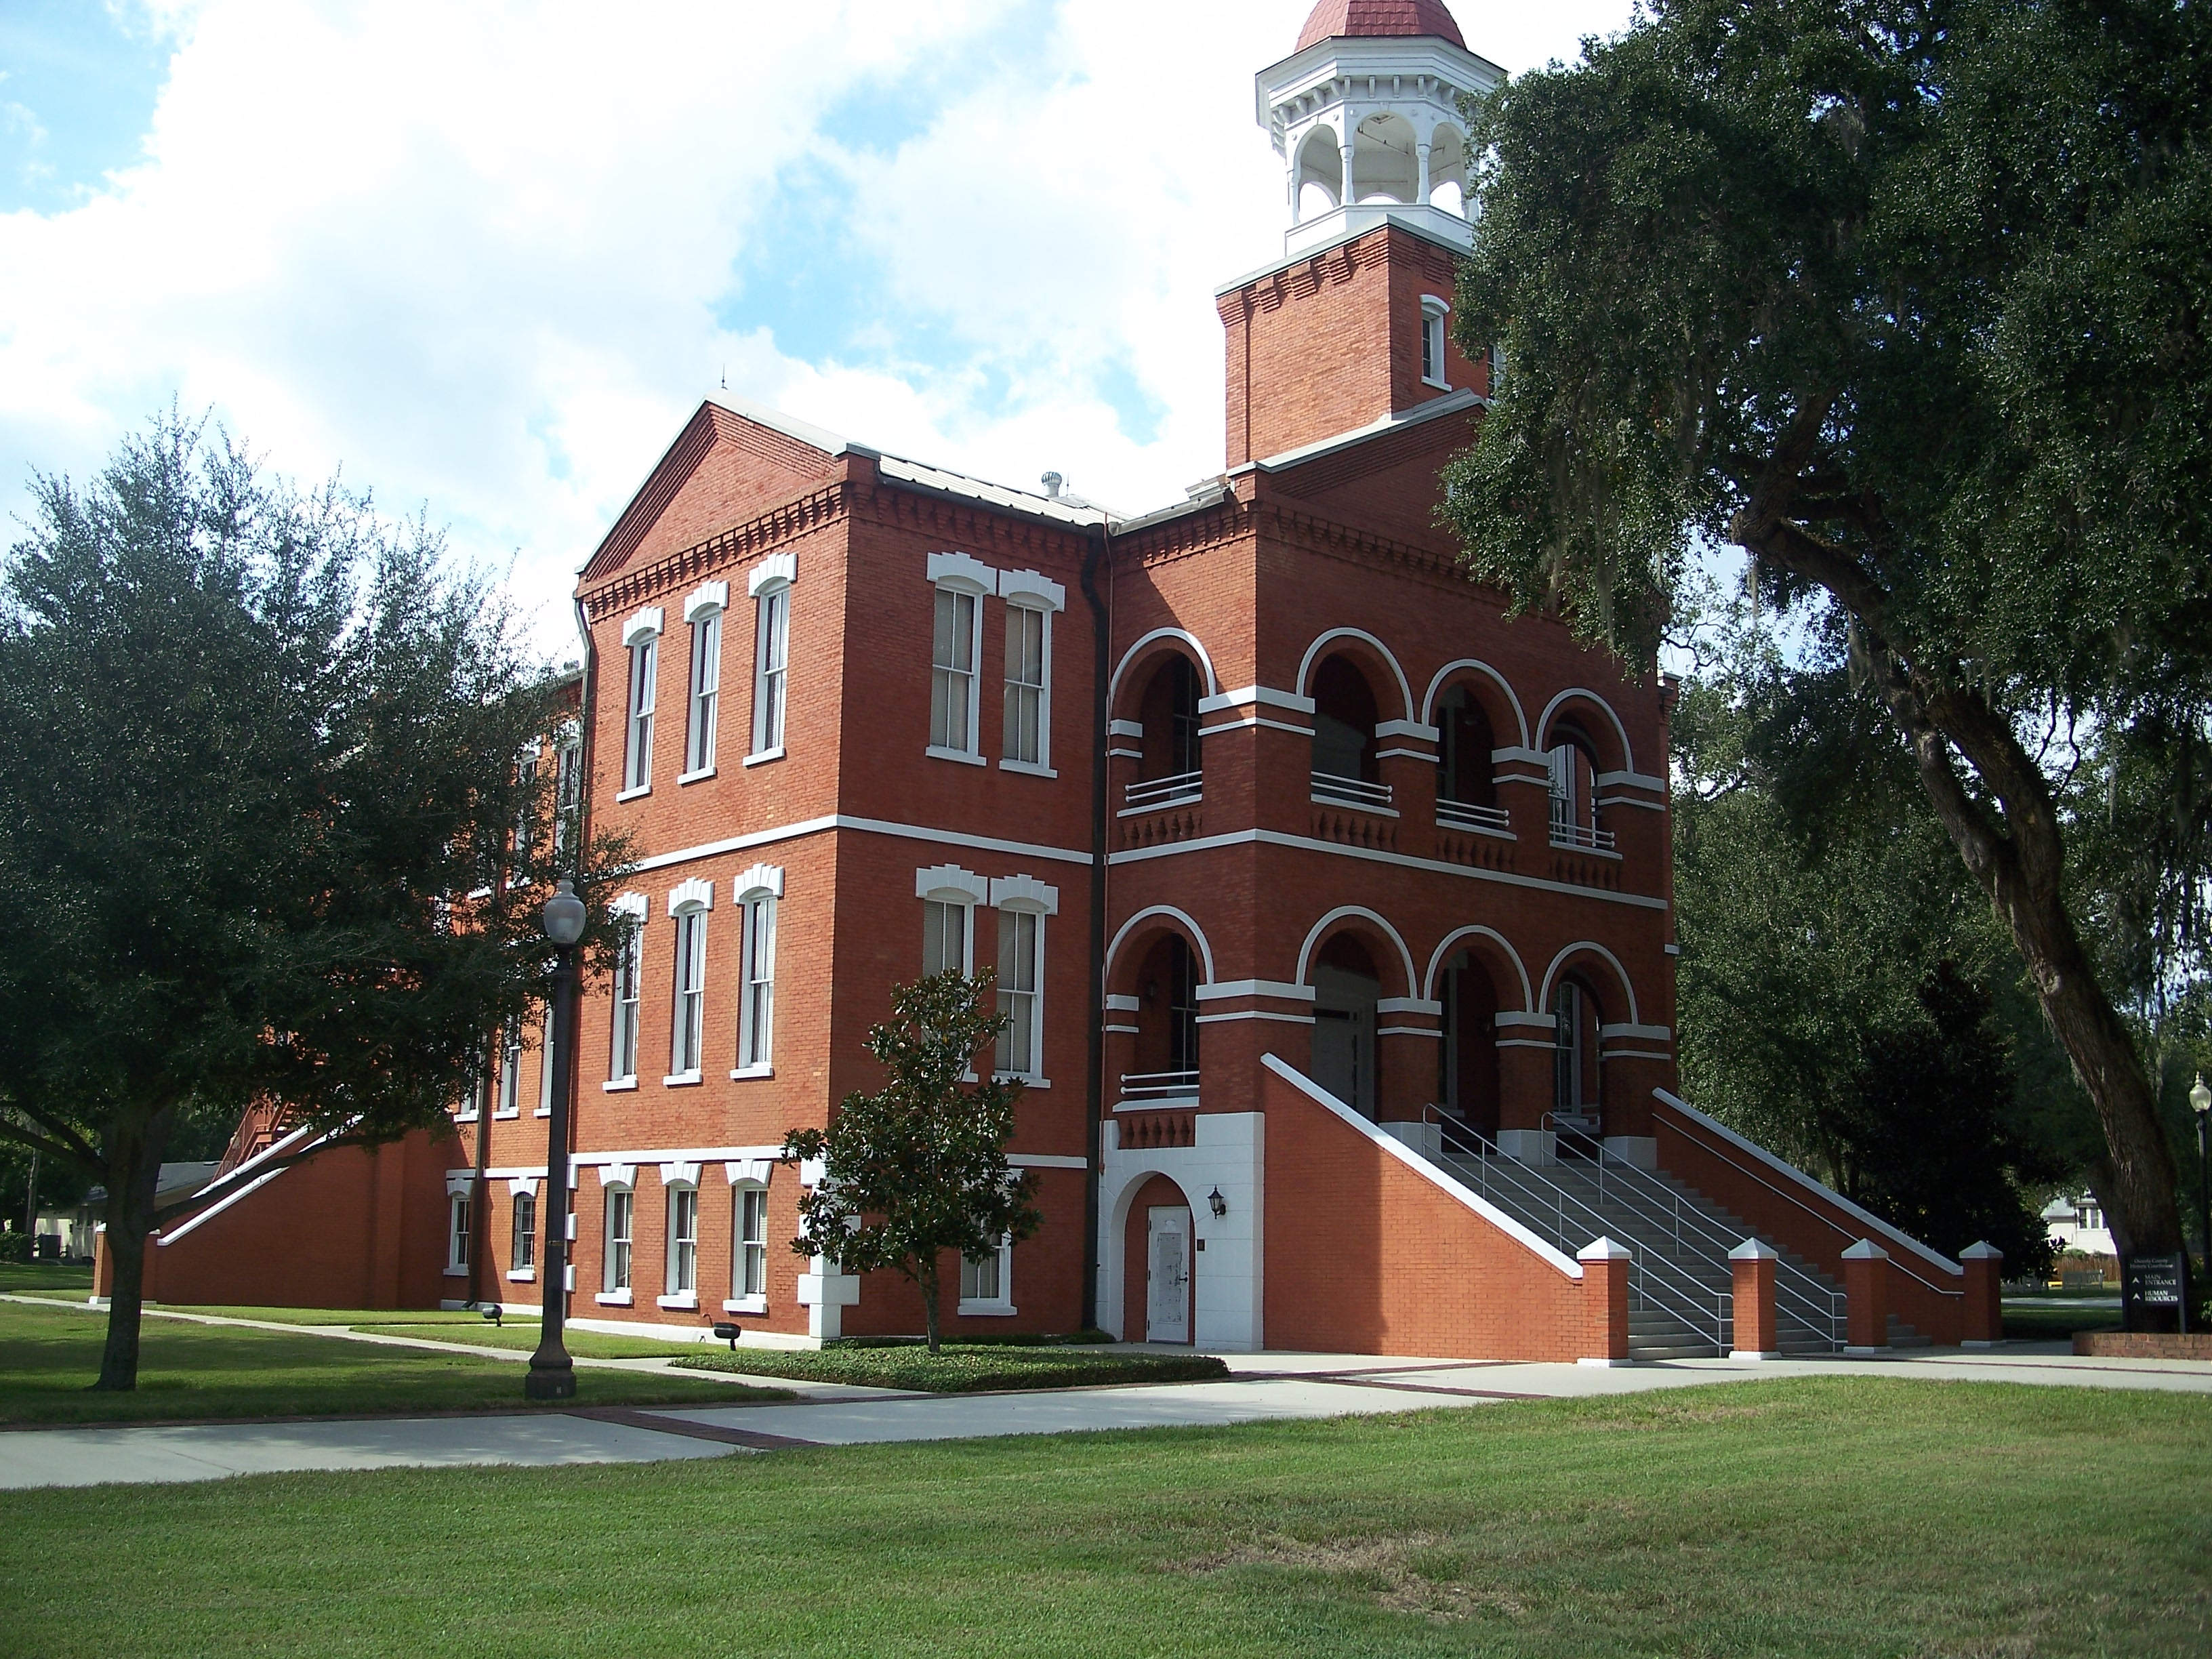 Osceola County Courthouse (Florida) - Wikipedia